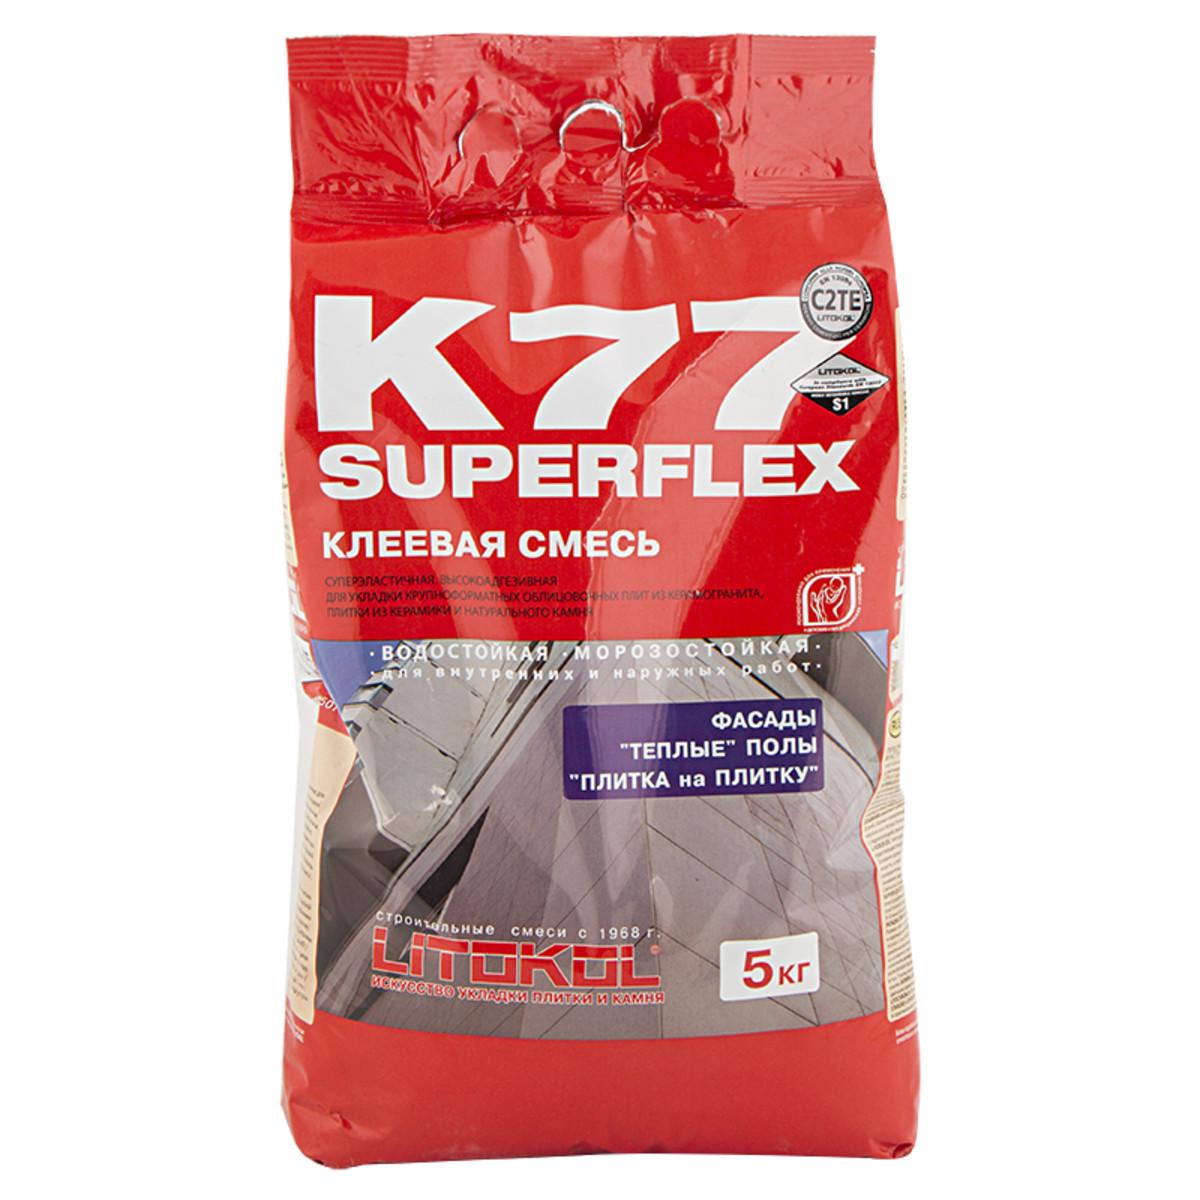 Клей Superflex K77 5 кг